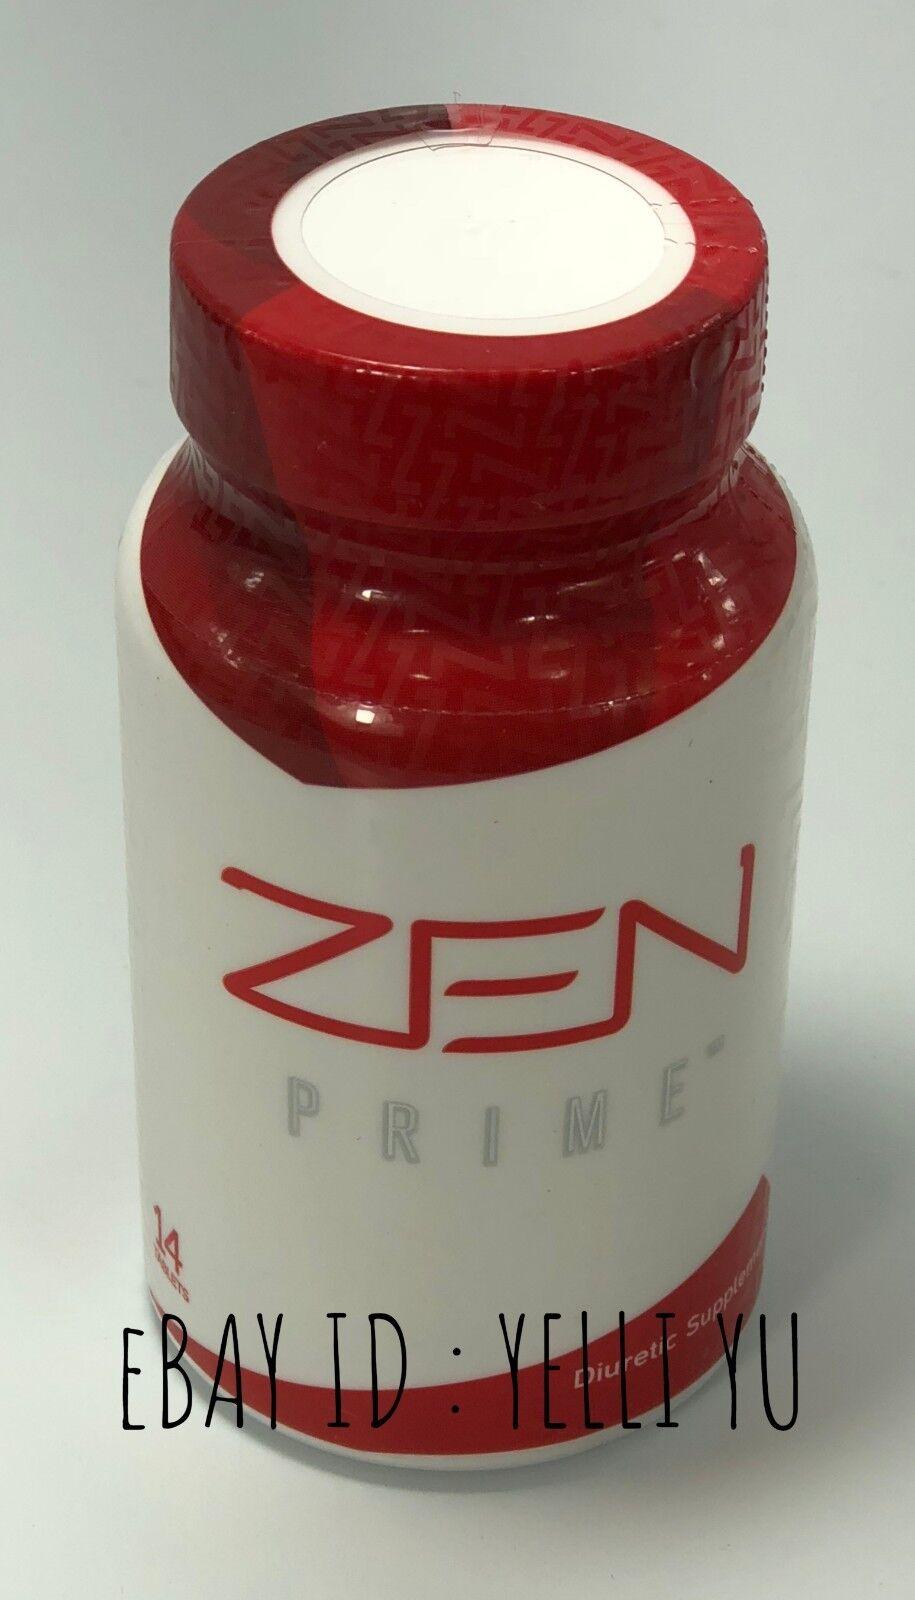 JEUNESSE ZEN PRIME™ - DIURETIC Supplement 14 tablets - DETOX Phase - 04/2020